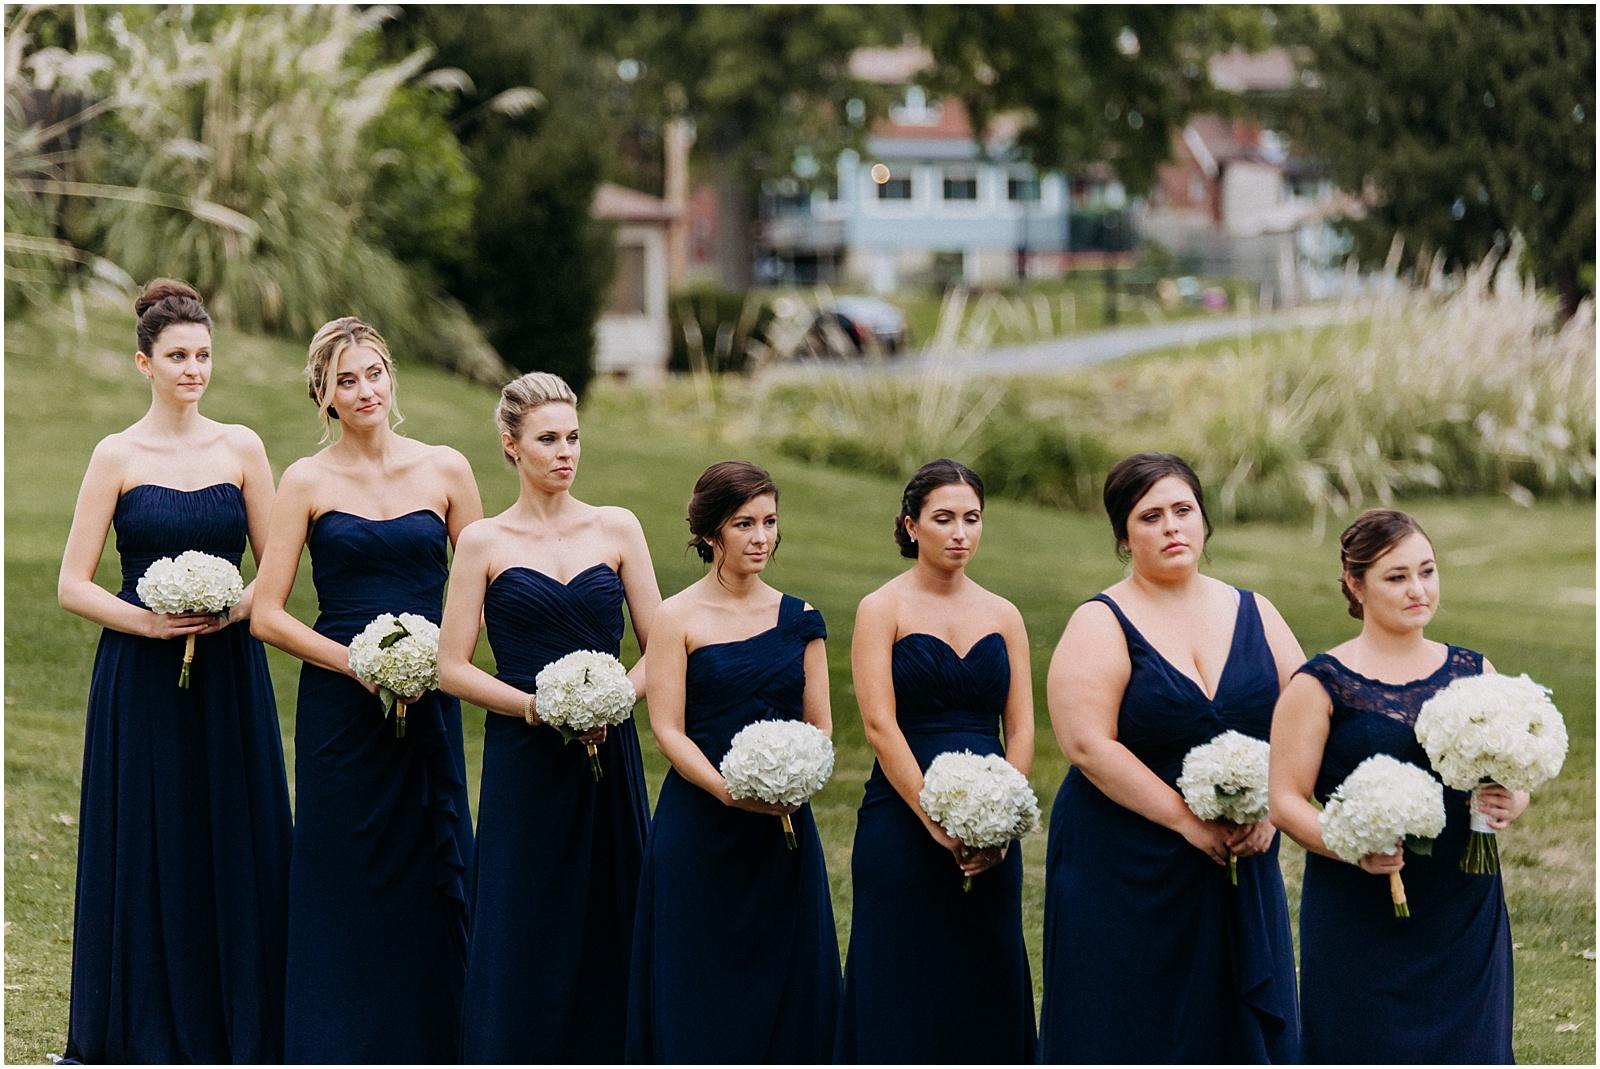 glen_echo_st_louis_mo_wedding_0105.jpg